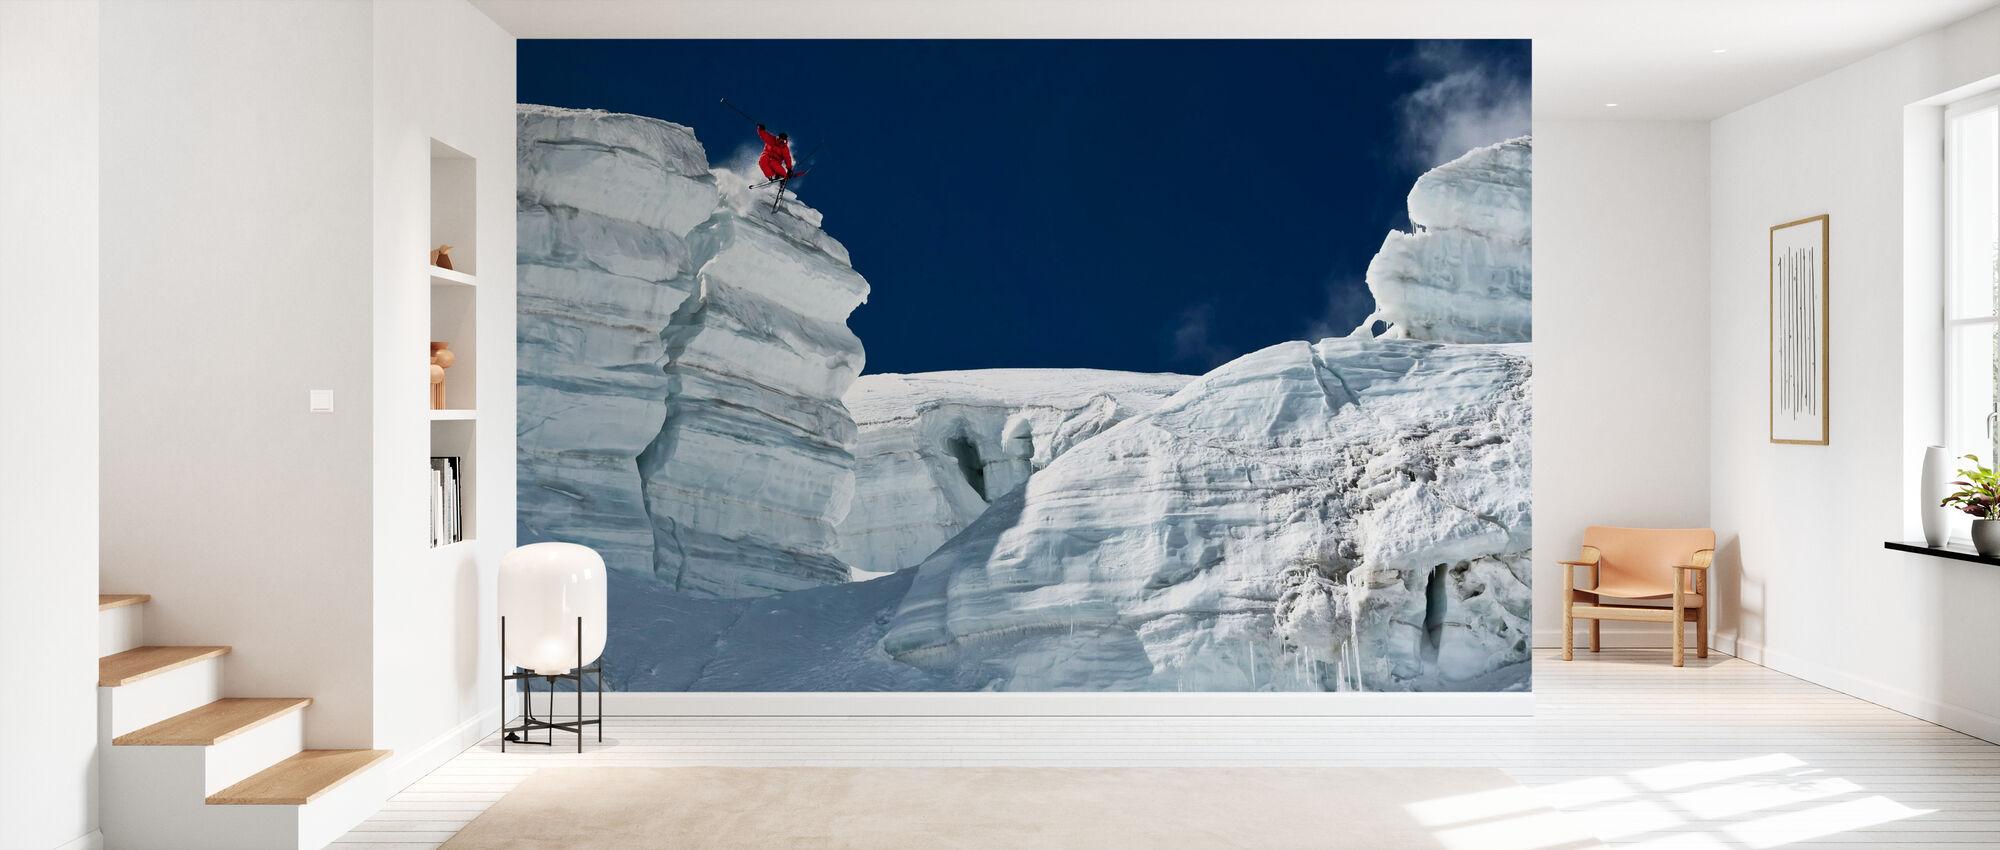 Cliff Jumping - Wallpaper - Hallway